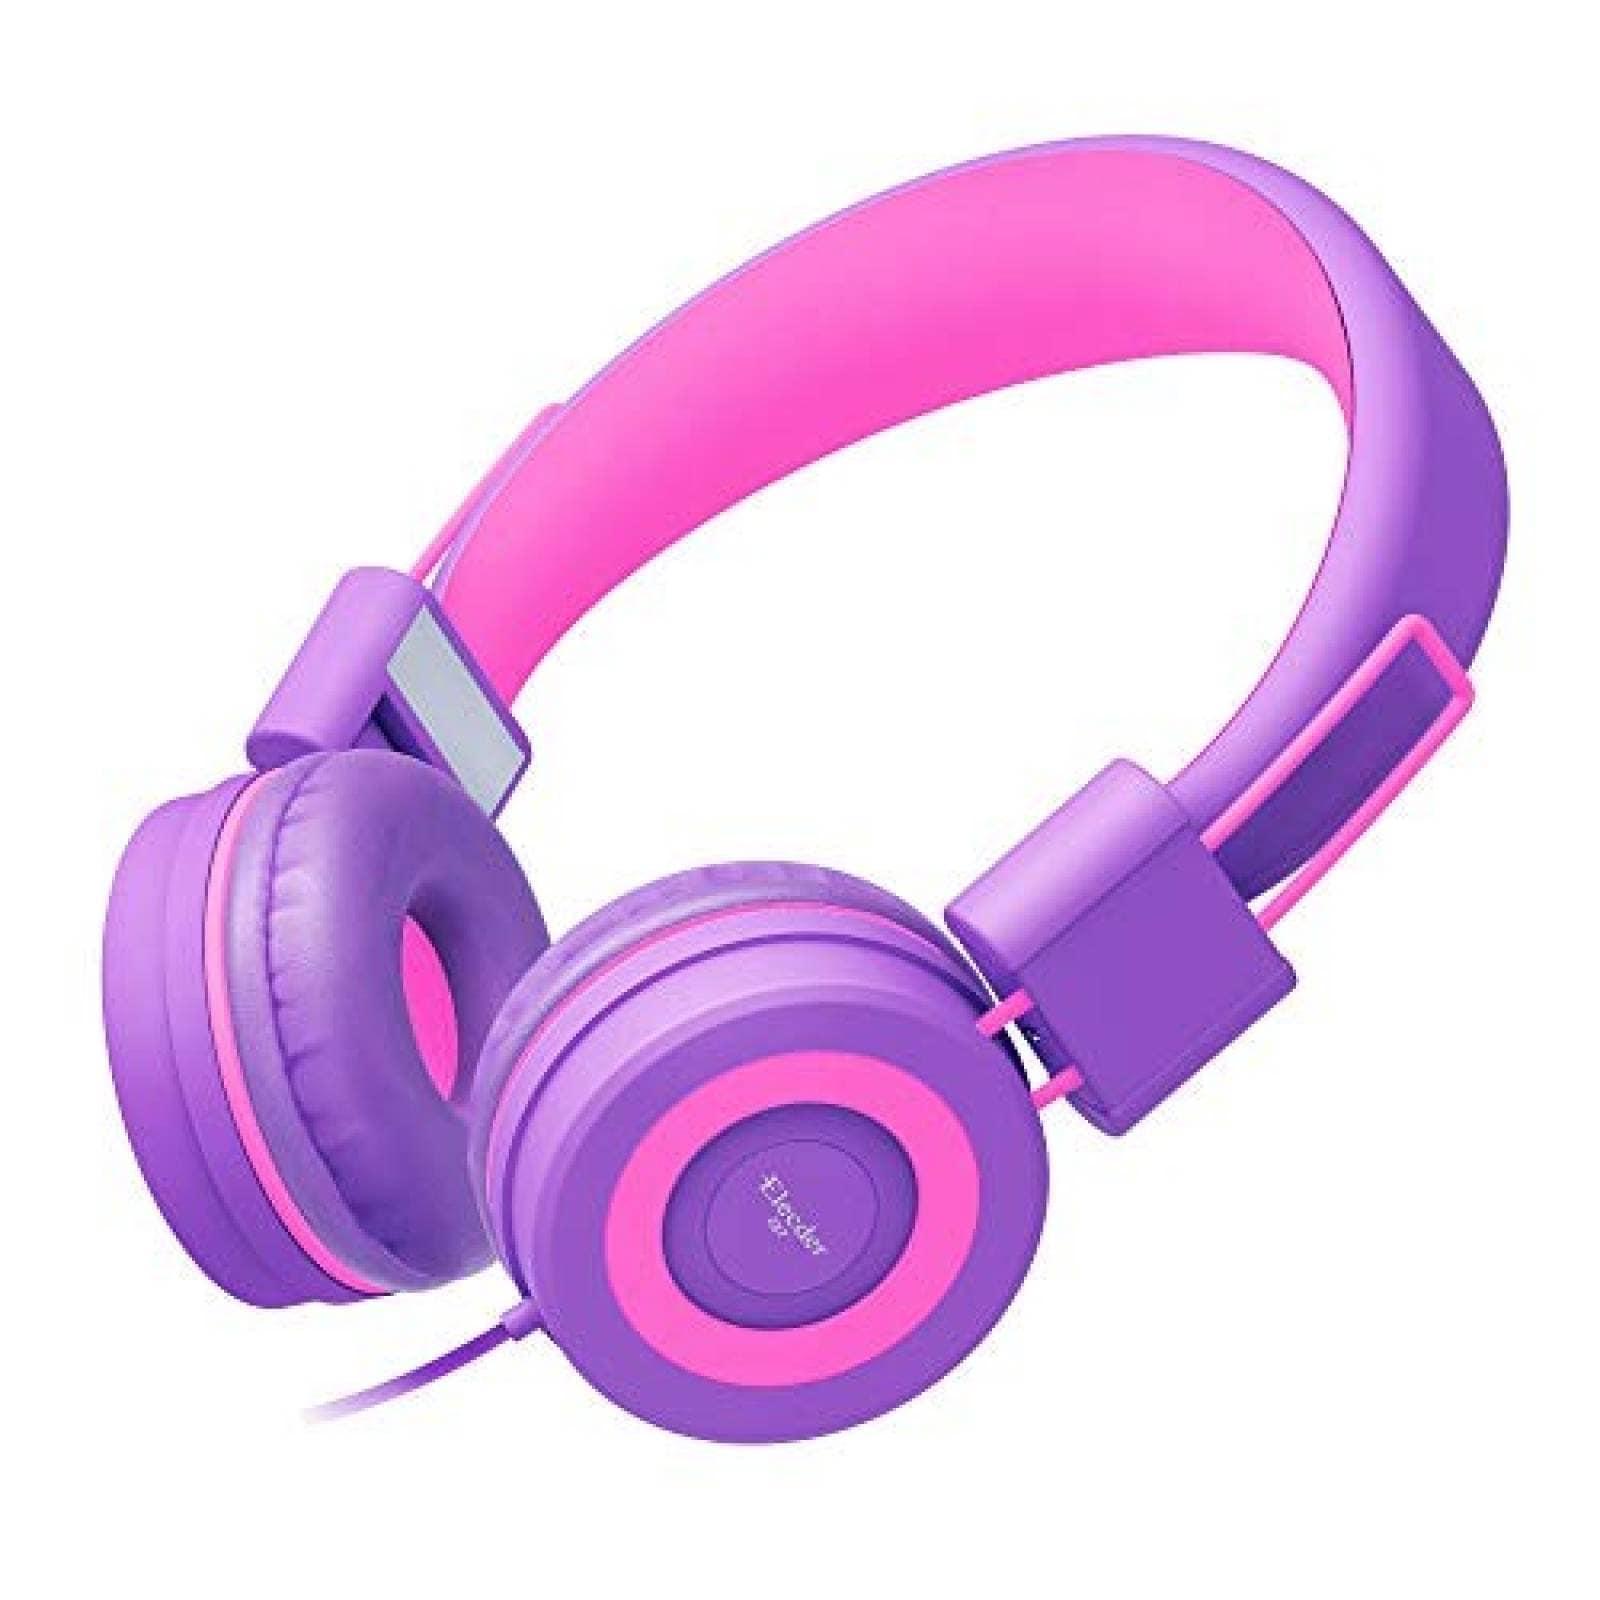 Audífonos Infantiles ELECDER i37 Plegables Ajustables -Rosa